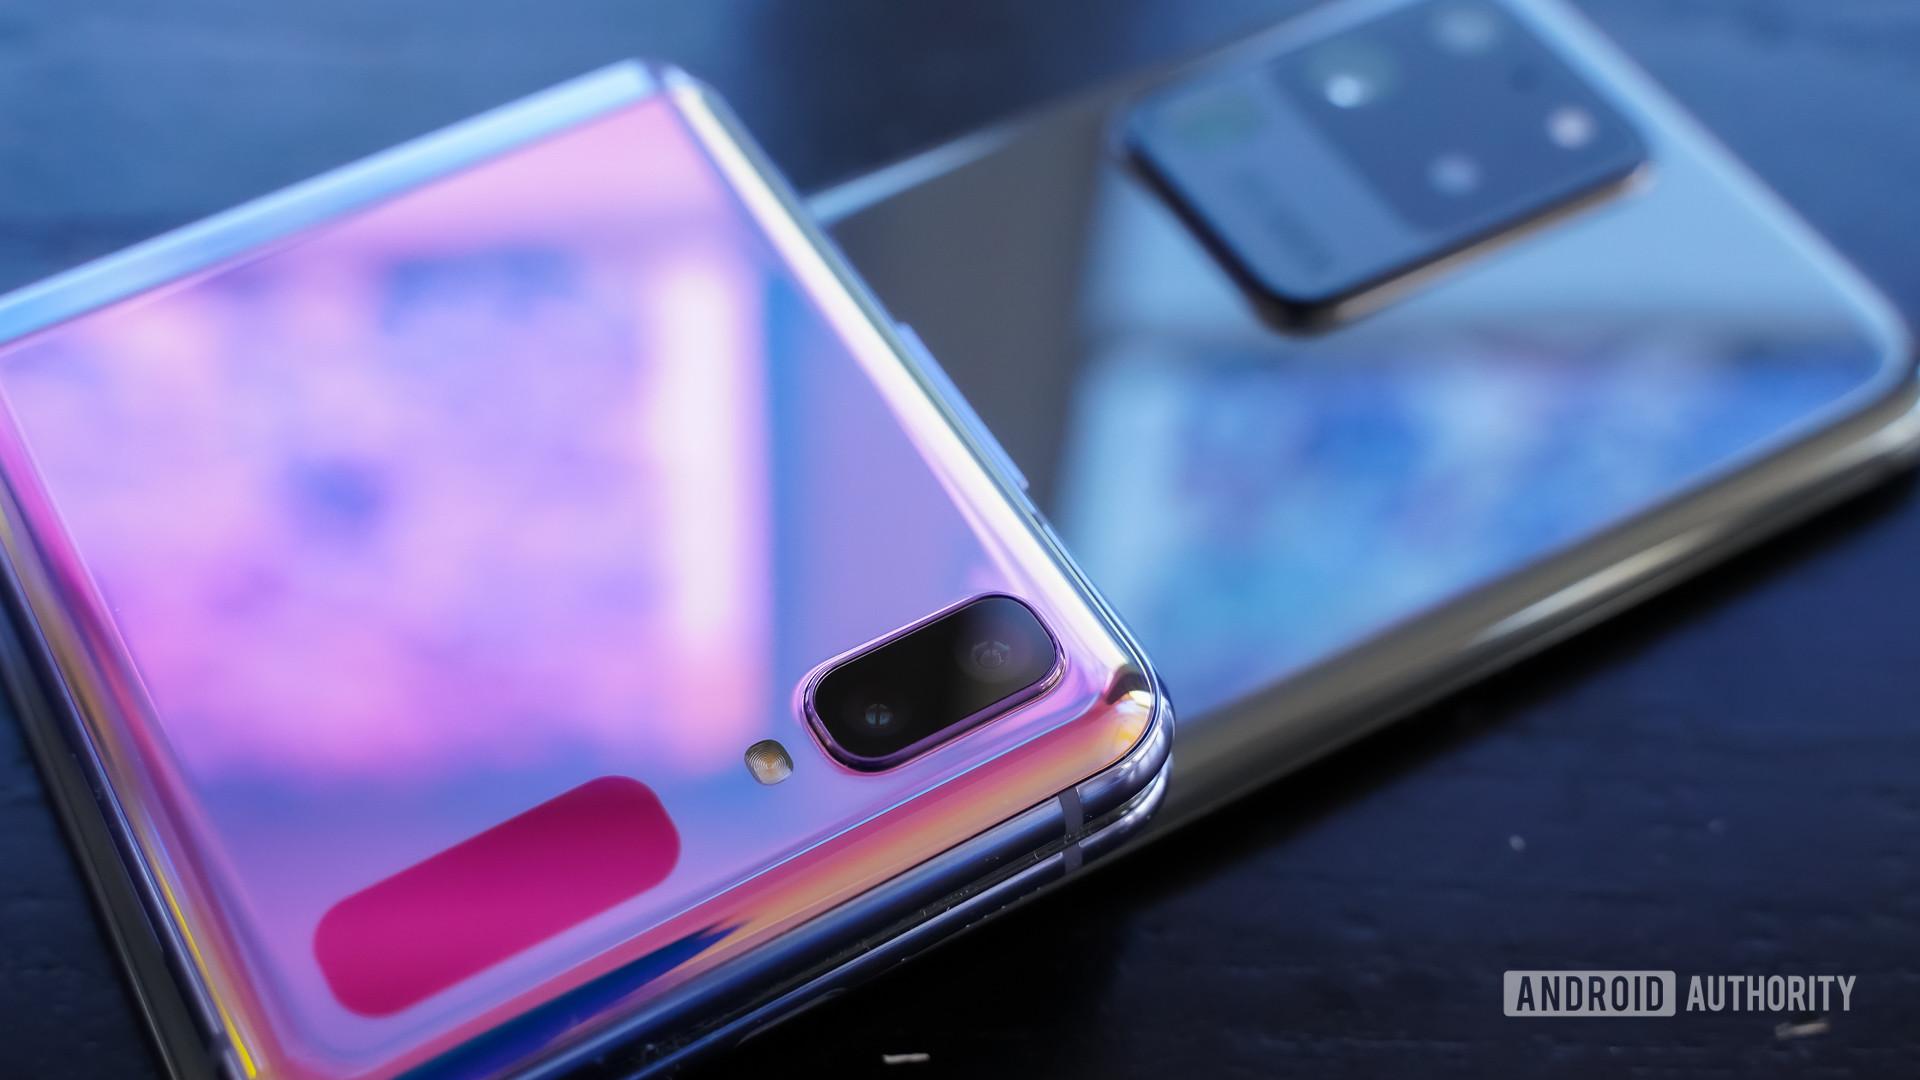 Samsung Galaxy S20 Ultra or Z Flip on top